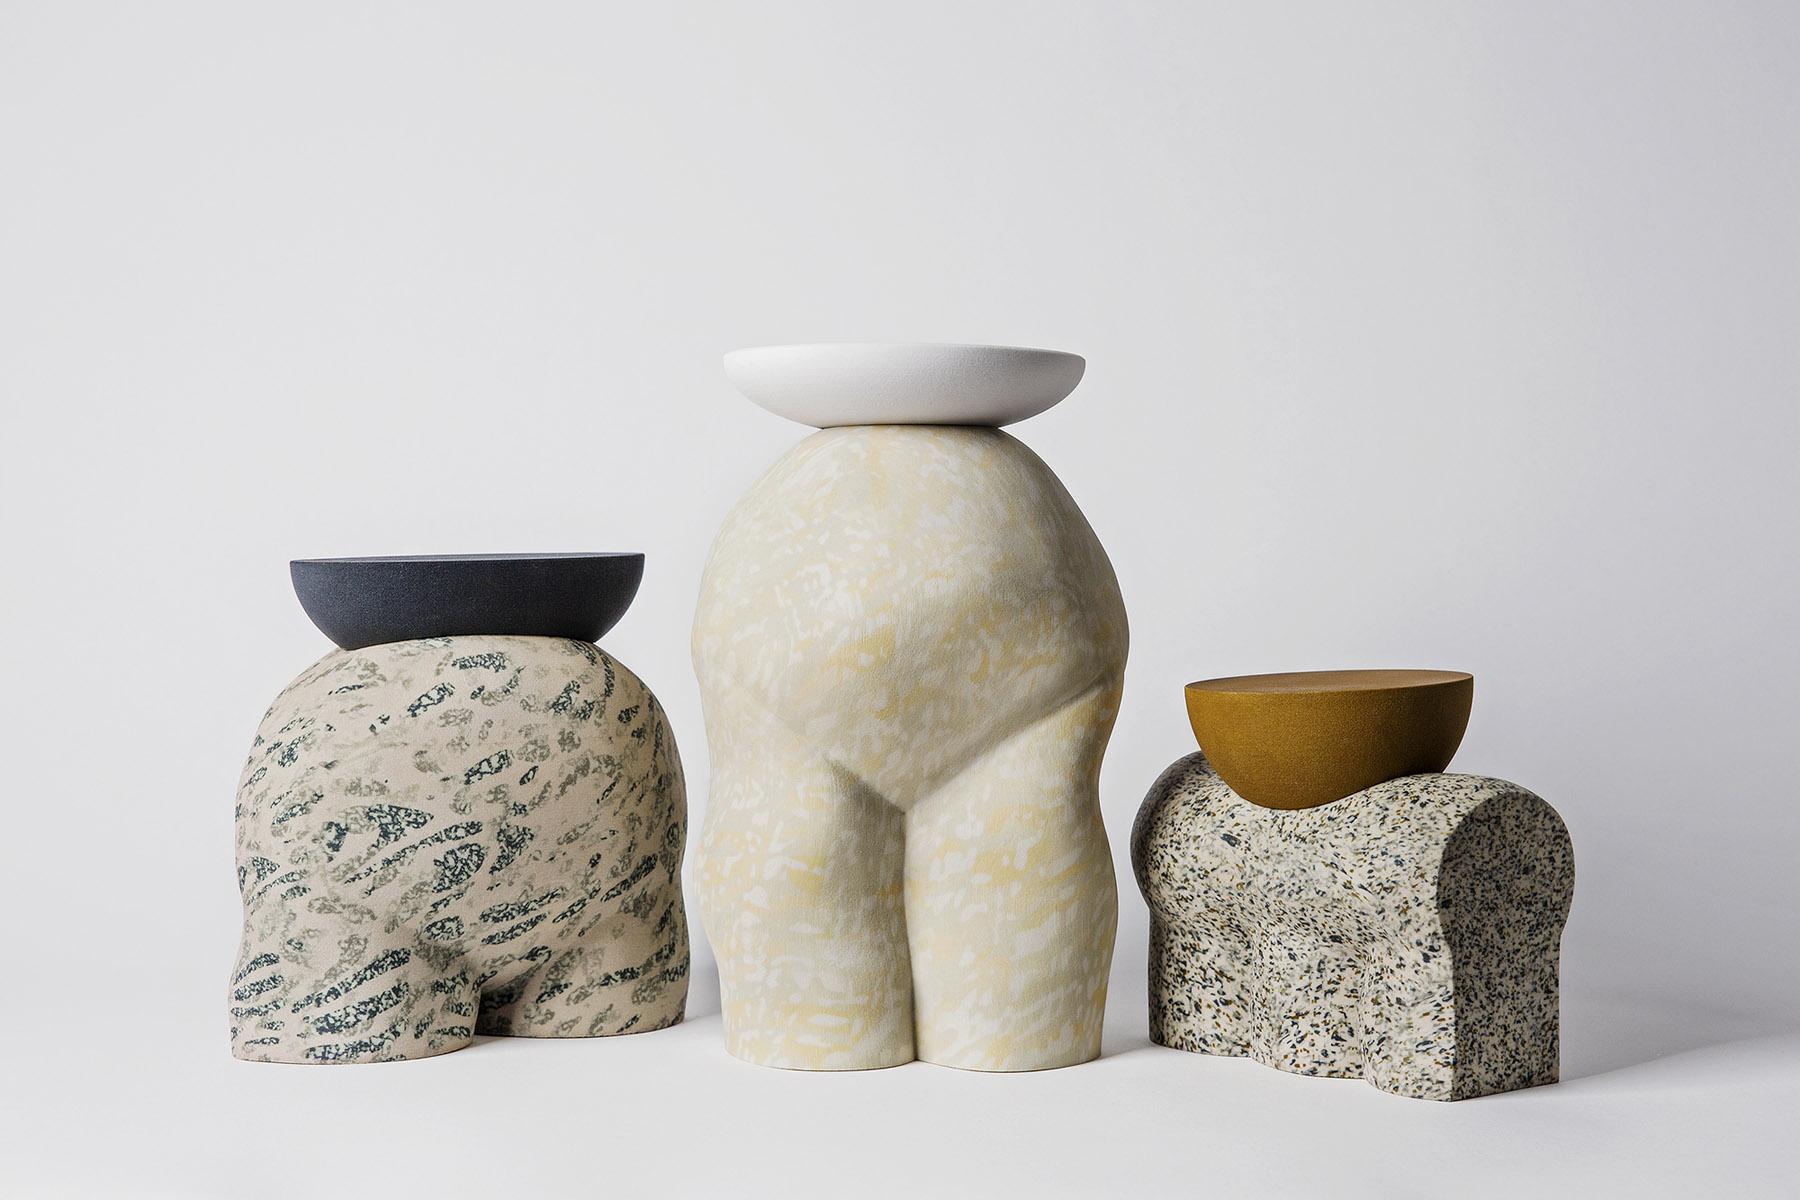 iGNANT-Design-Wang-Söderström-Table-101-002